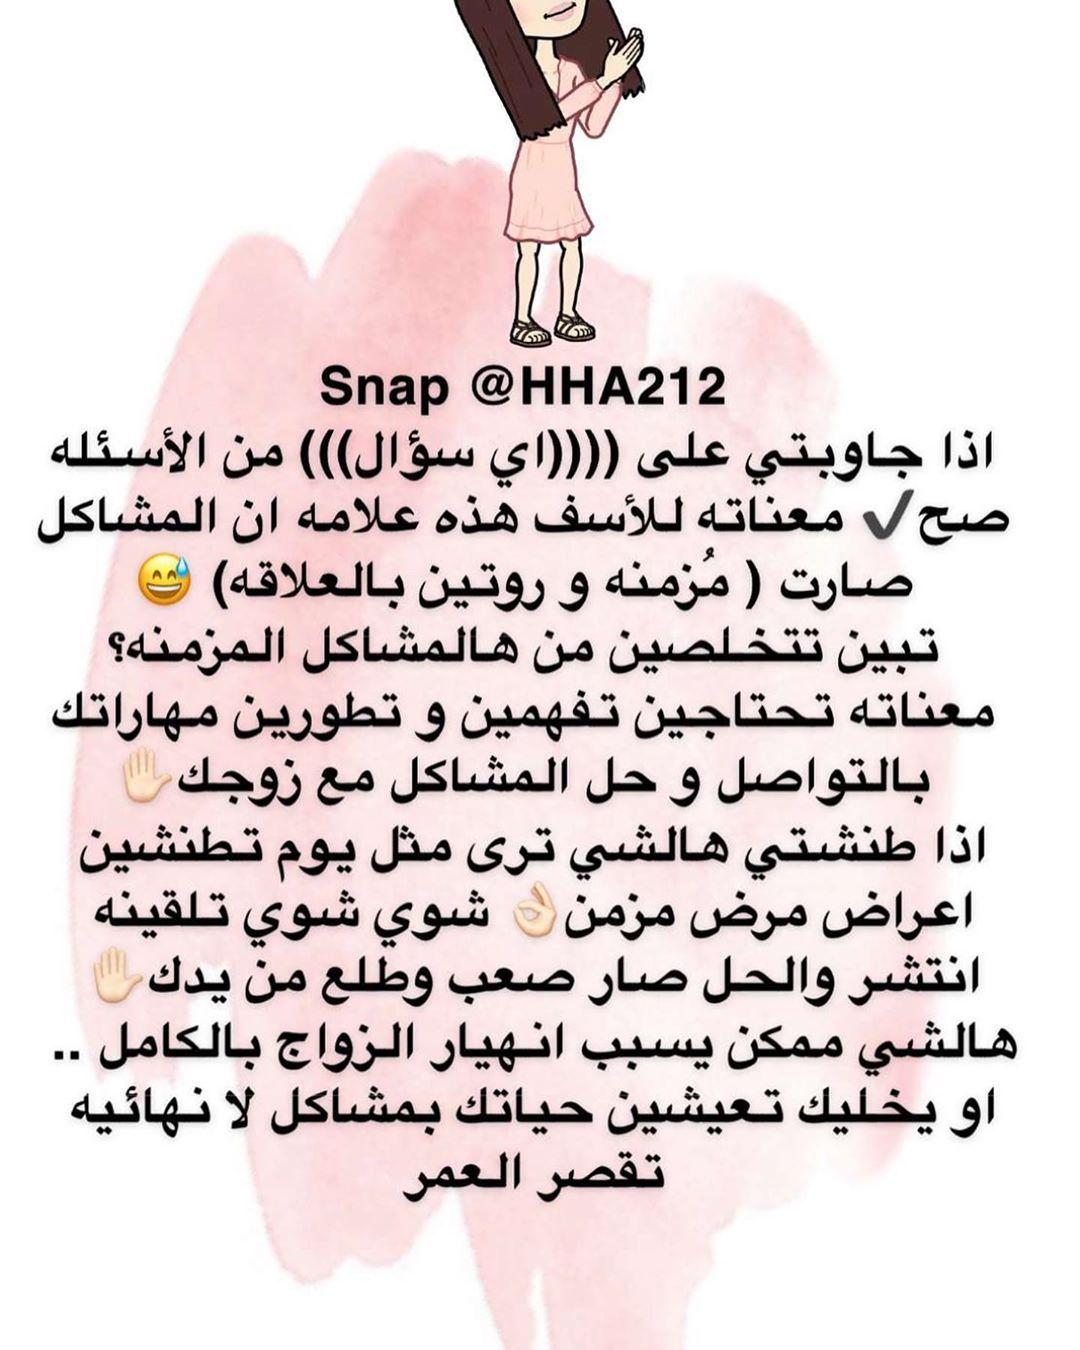 Pin By Mahawi On اتكيت المرأة الذكية في التعامل مع المشاكل الزوجية Word Search Puzzle Words Thumbs Up